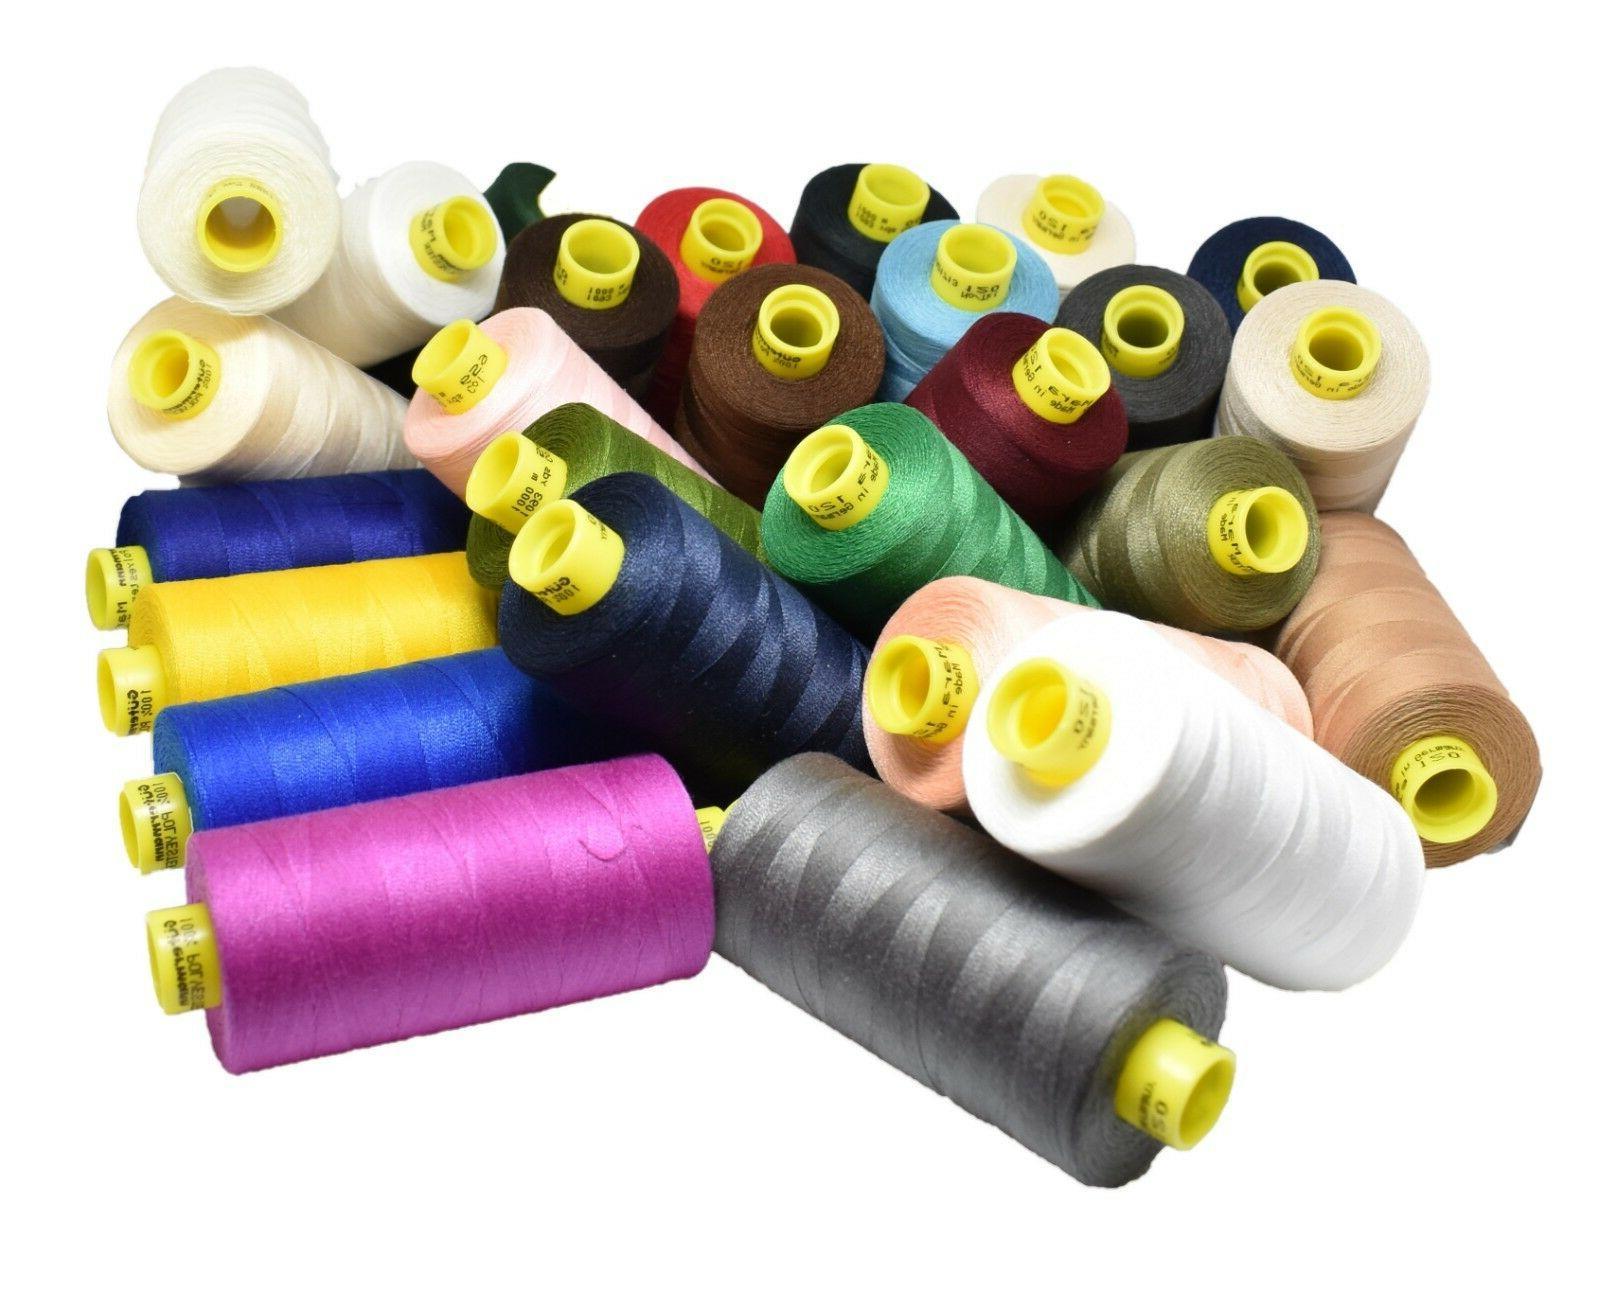 mara 120 polyester sew all thread 1000m